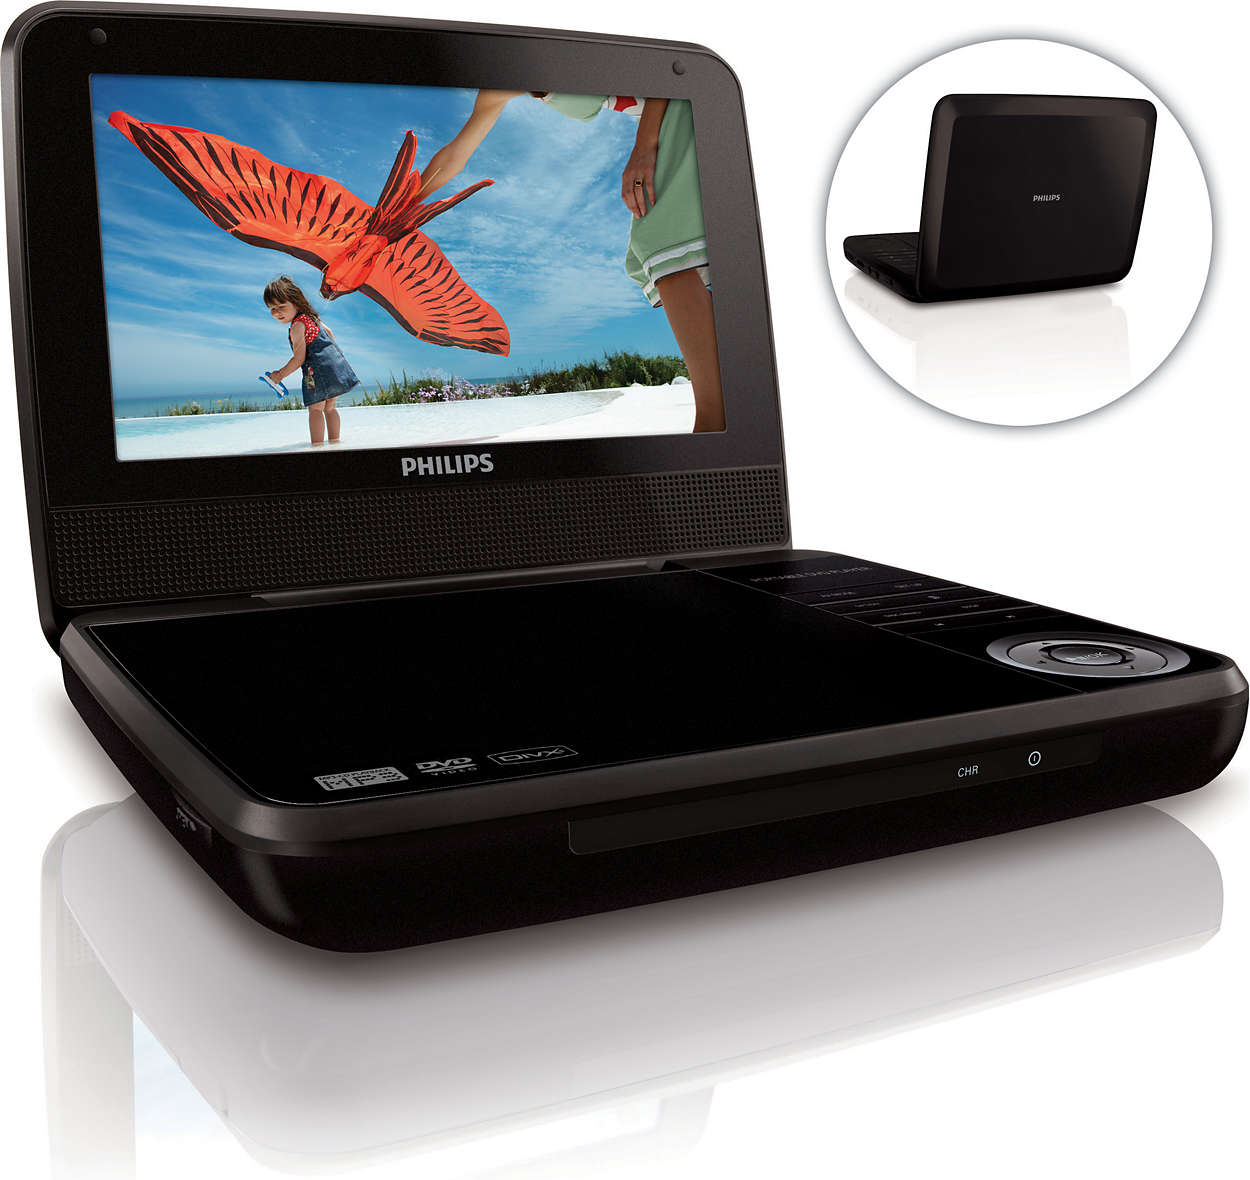 lecteur dvd portable pd7001b 12 philips. Black Bedroom Furniture Sets. Home Design Ideas